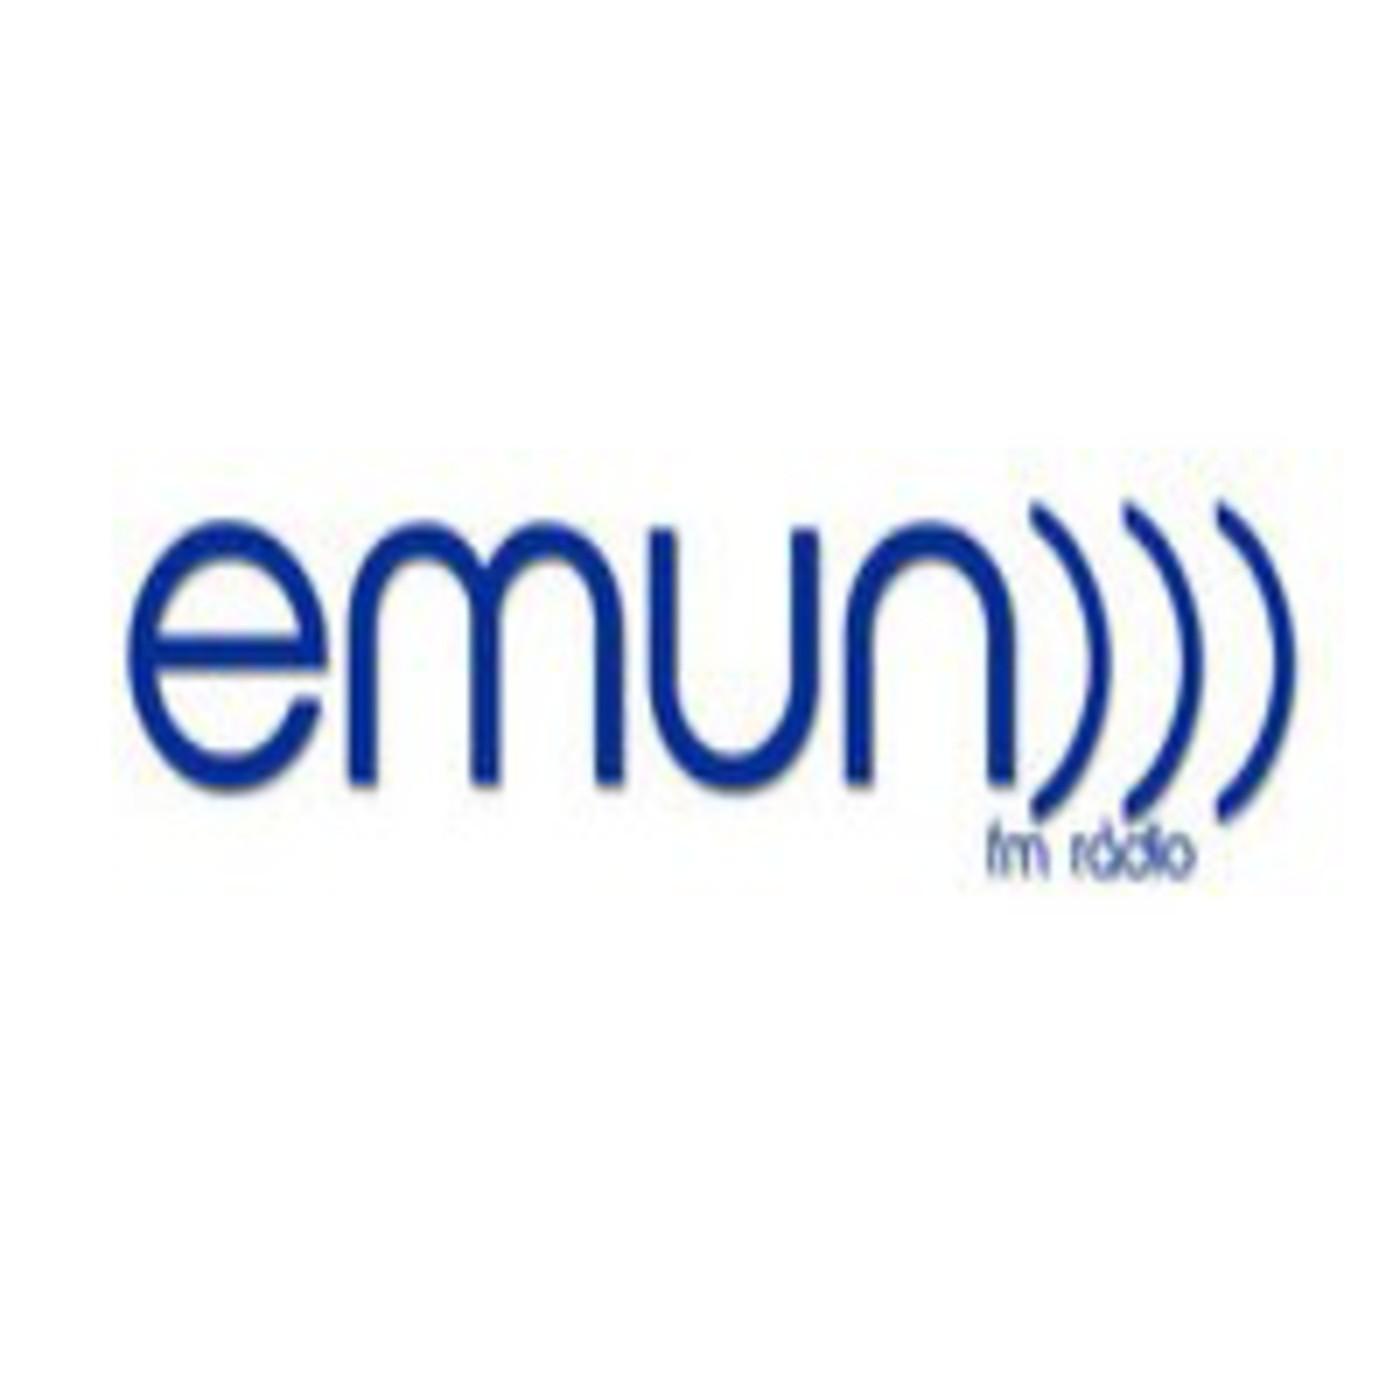 <![CDATA[EMUN FM Ràdio]]>